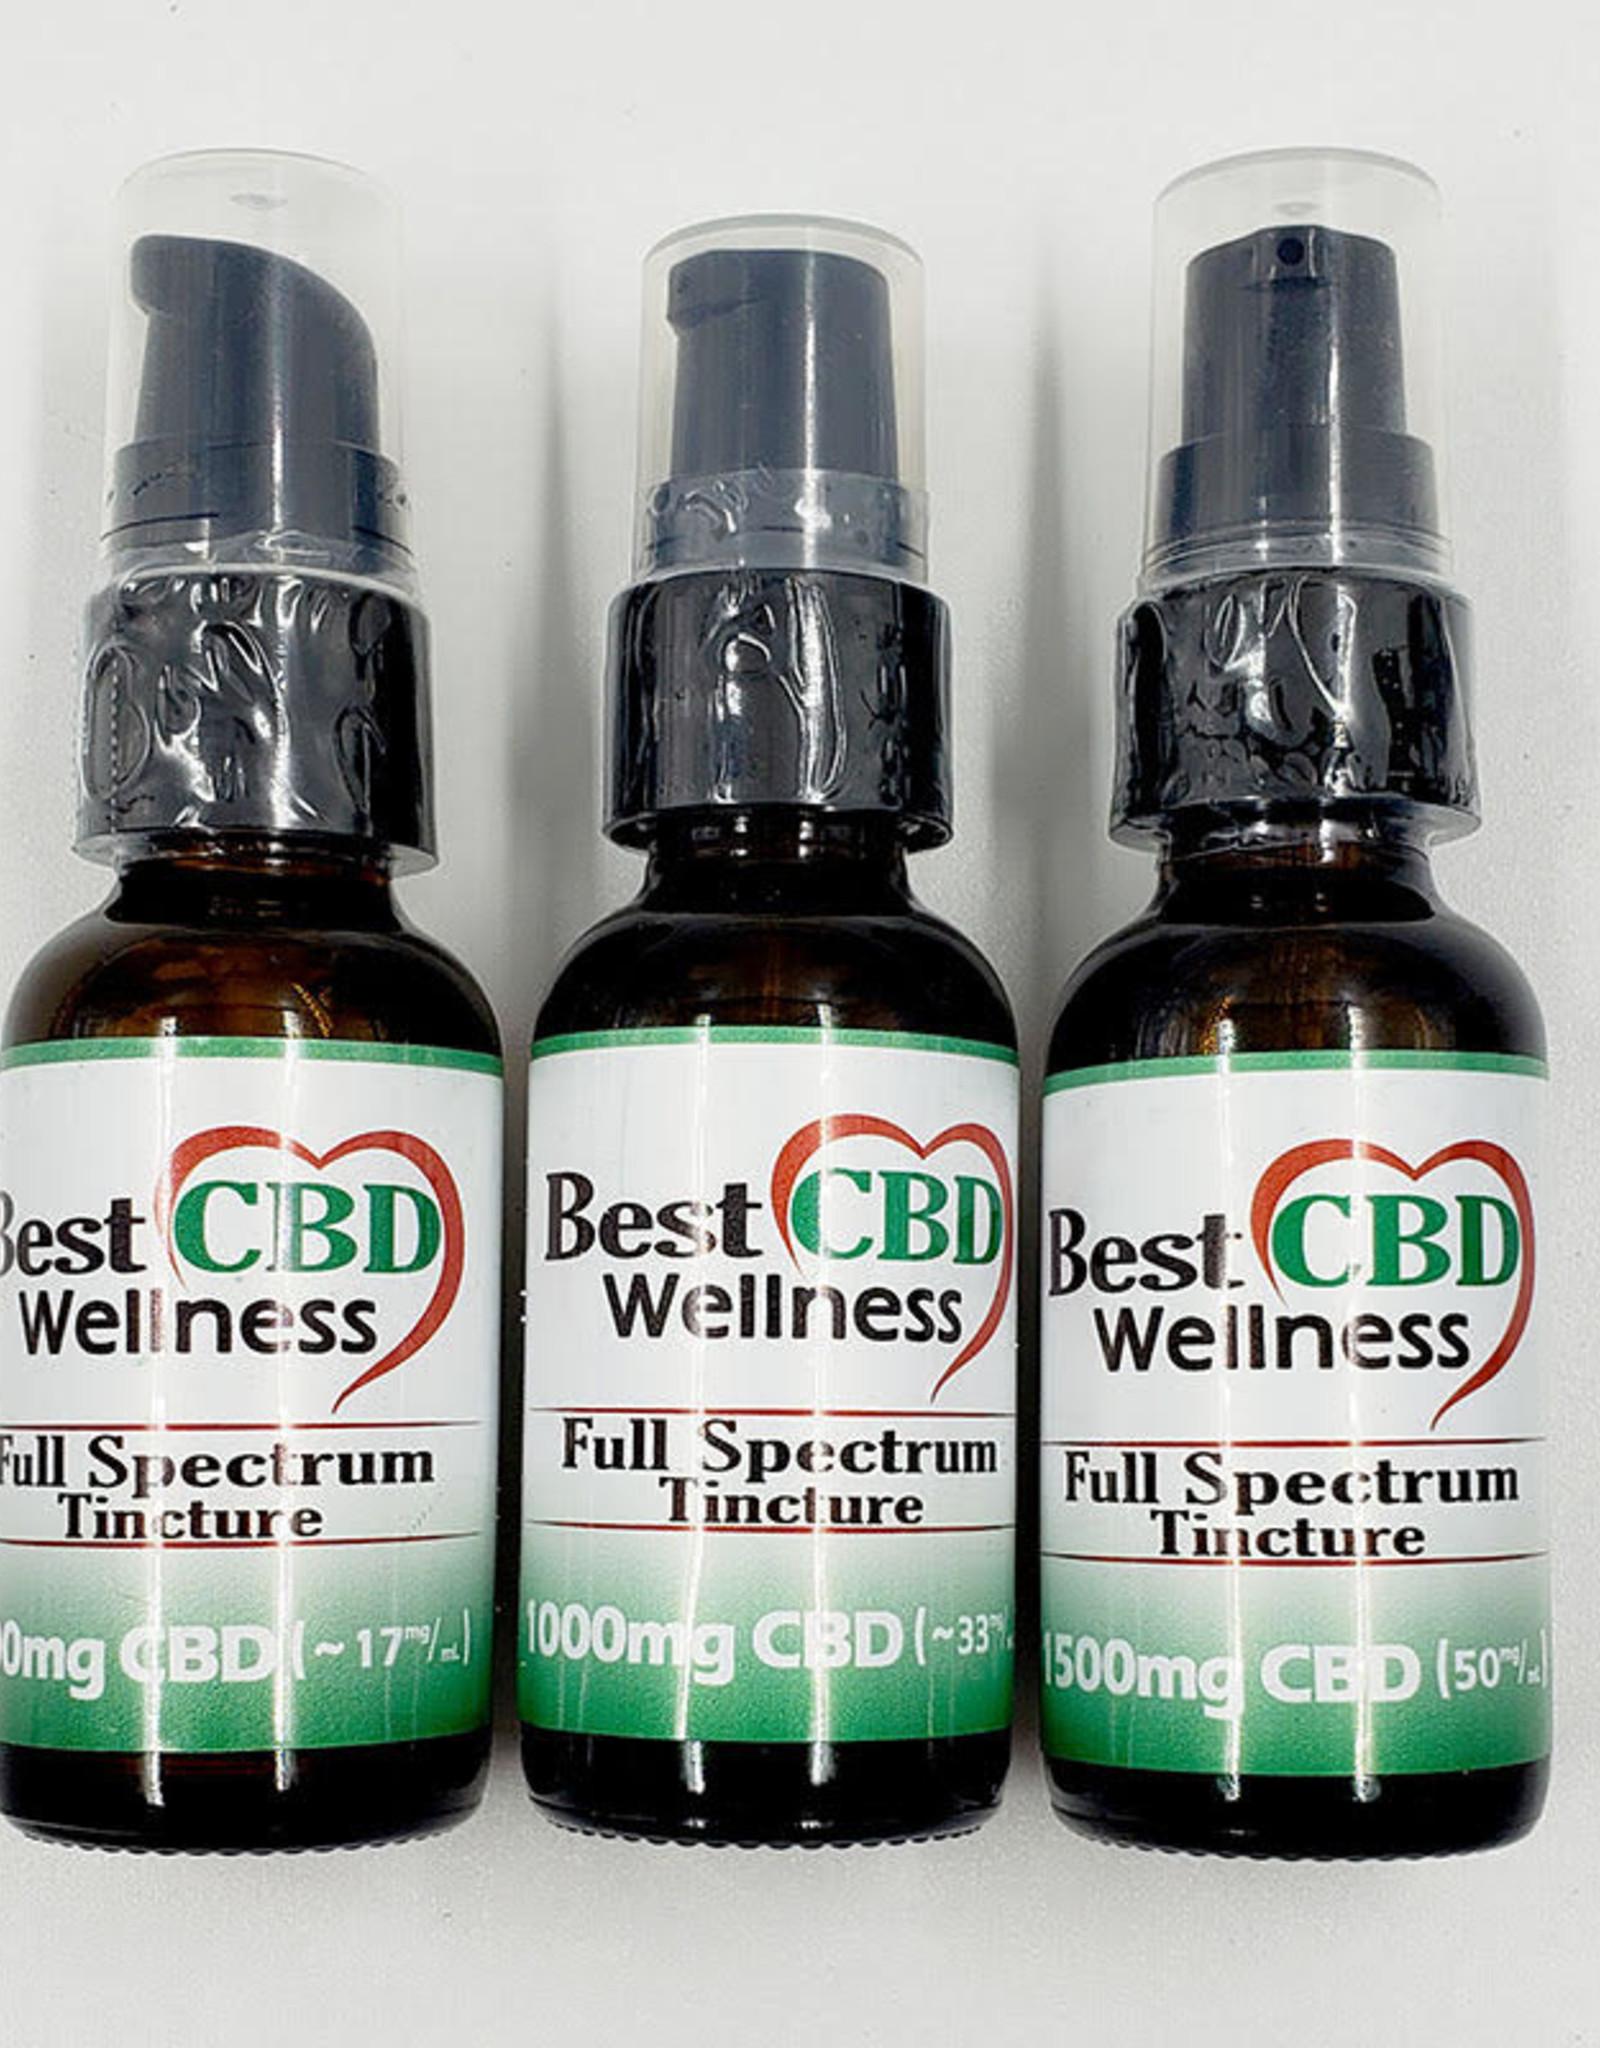 Best CBD Wellness Full Spectrum CBD Oil Tincture 1000mg Unflavored